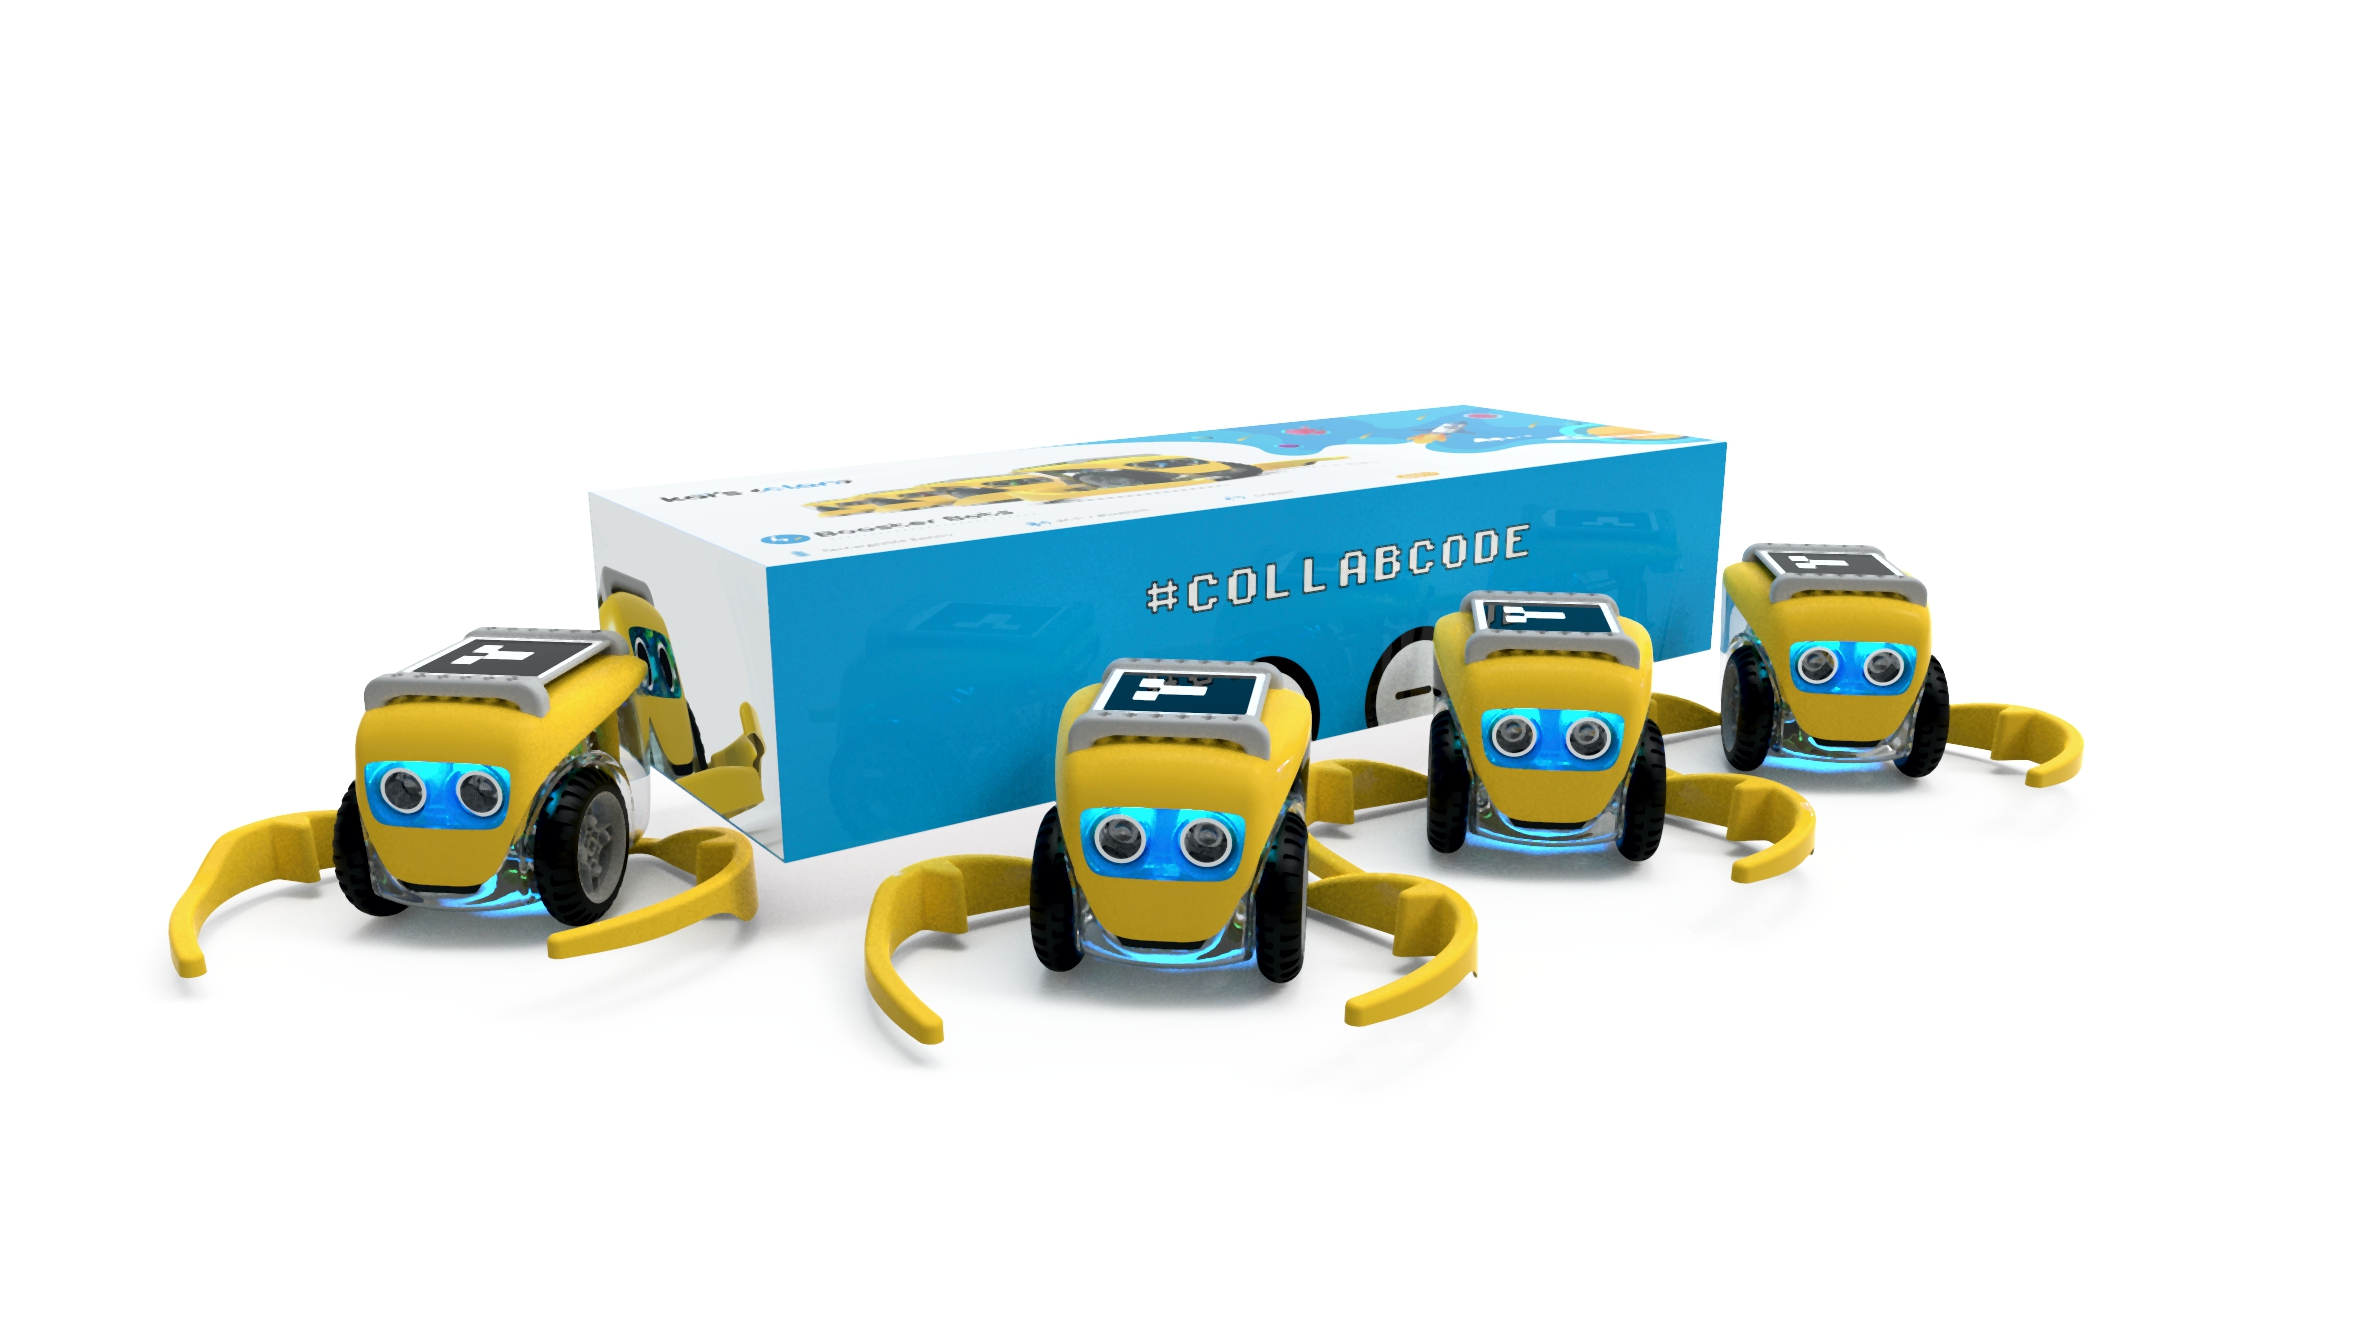 Kai Robot 4 pack